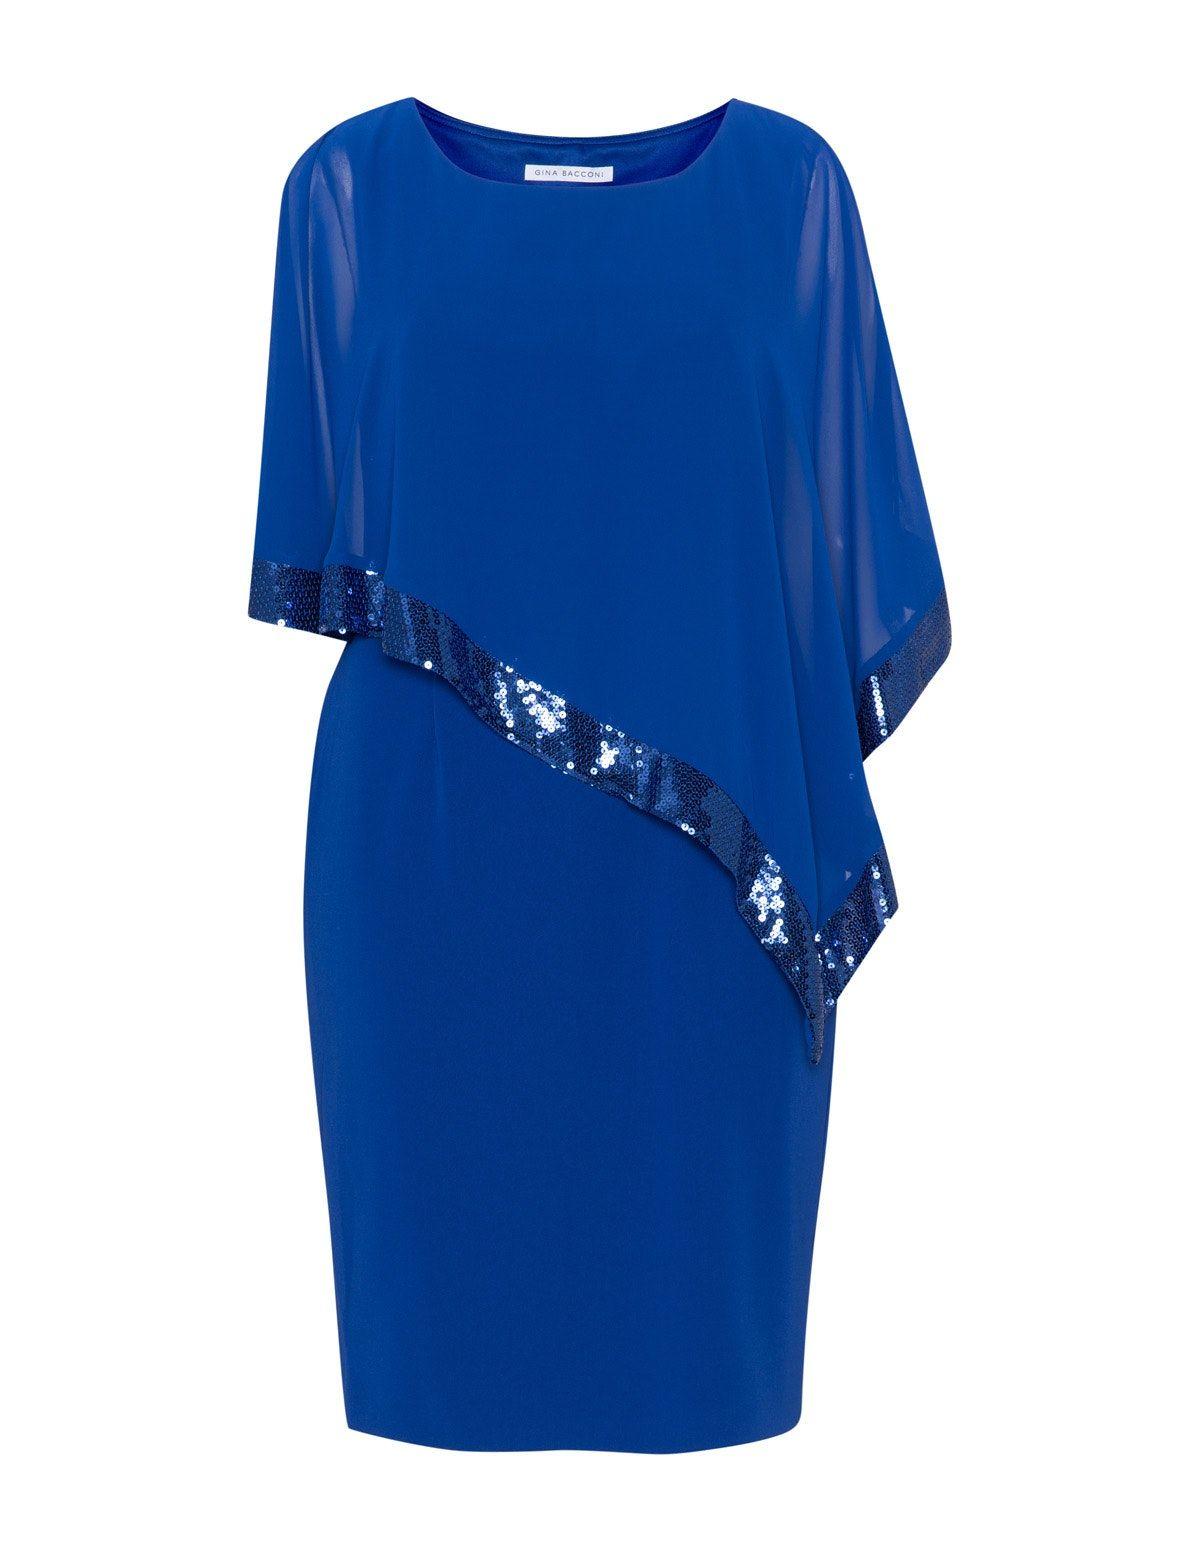 Gina Bacconi Crêpe-Kleid mit Überwurf in Blau  Kleider, Überwurf